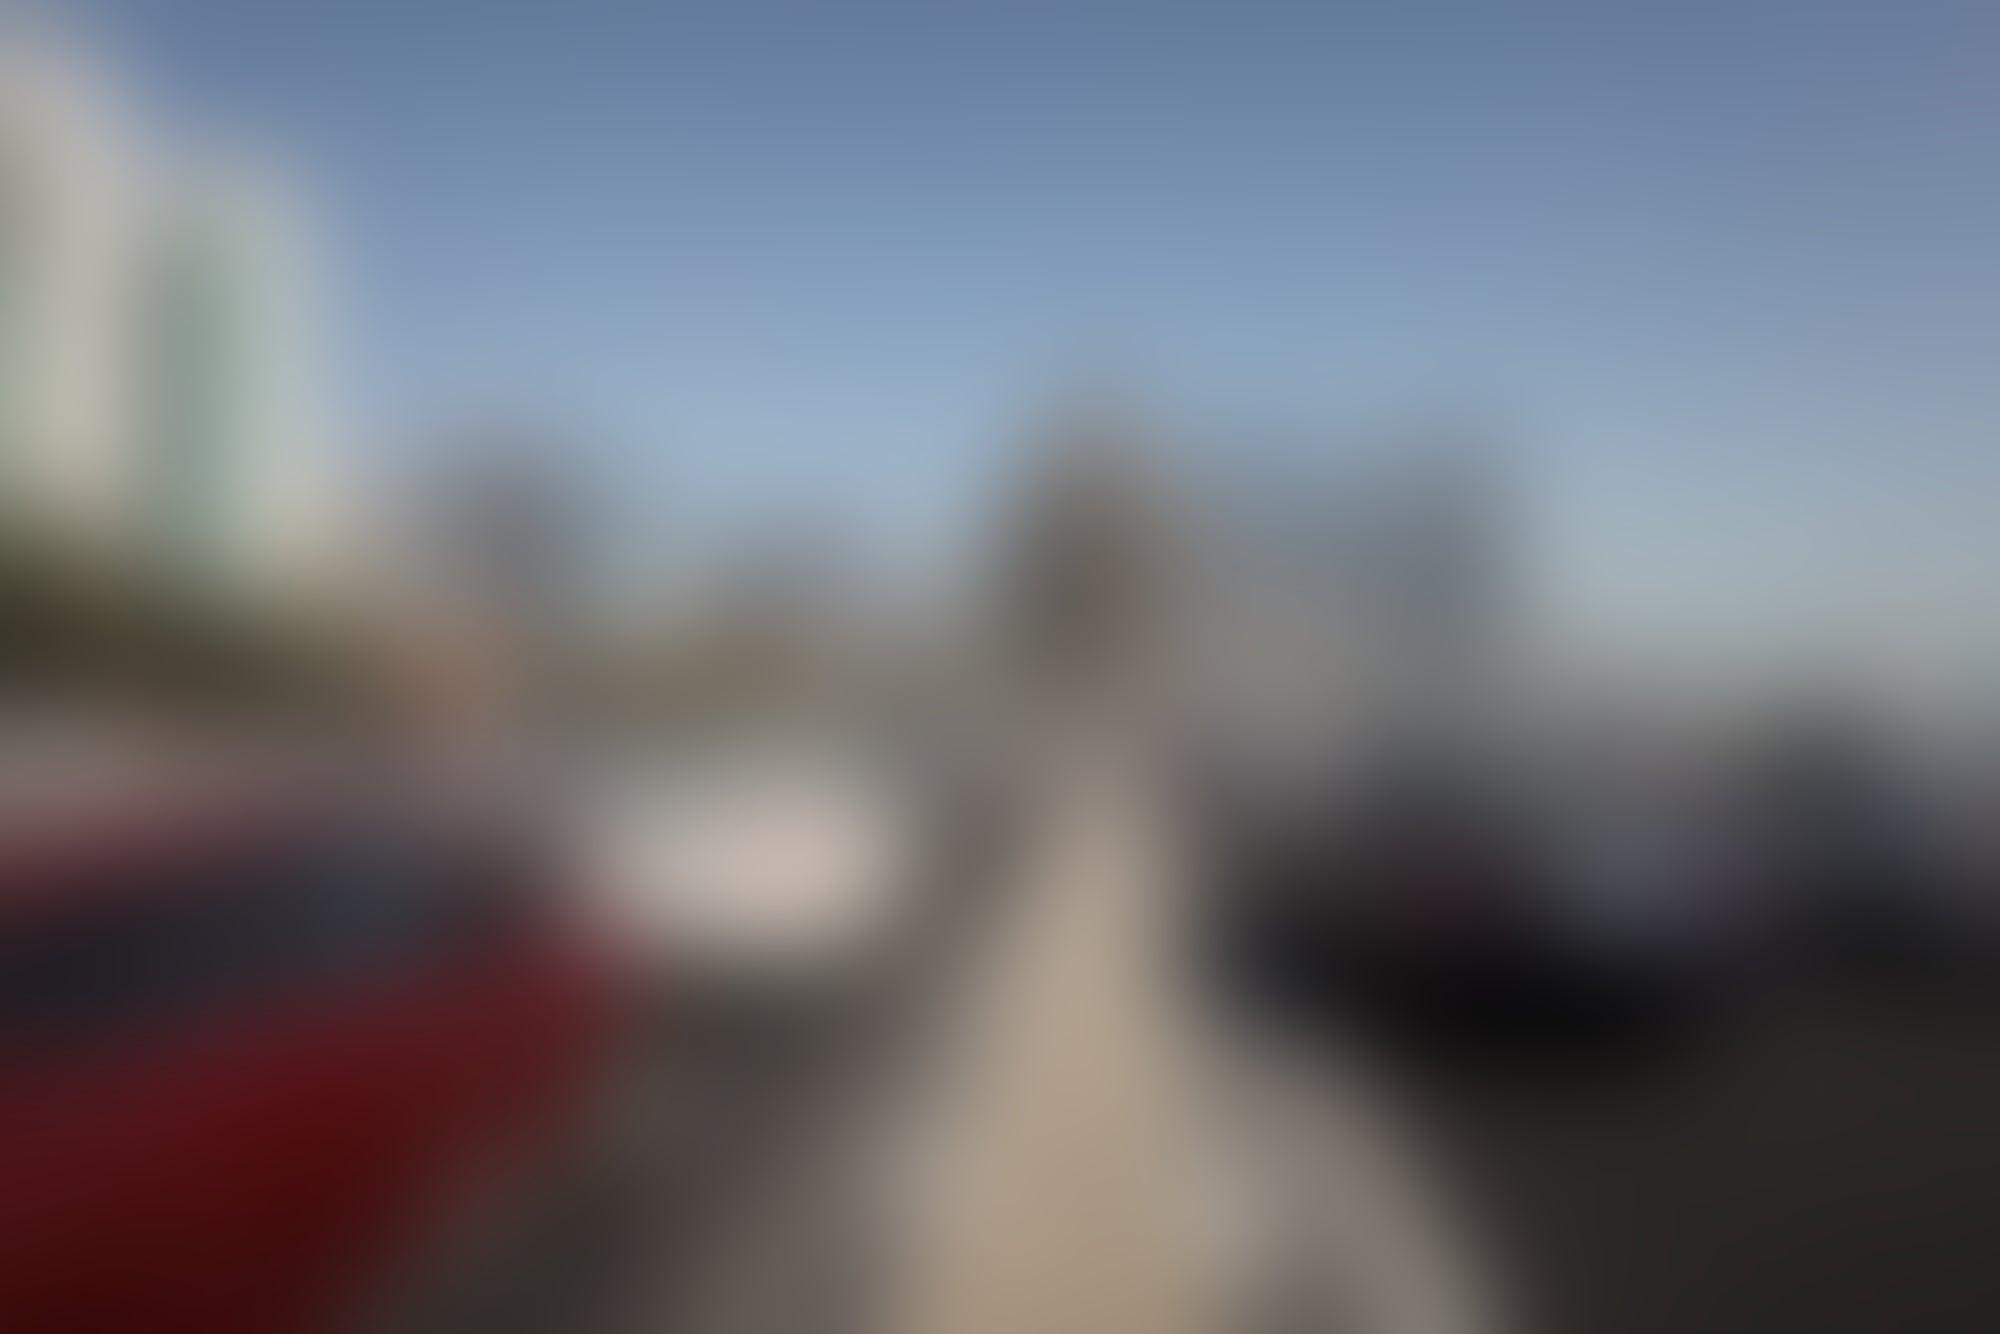 Let's Go For A Ride! Qatar-Centric Q-Cab Hopes To Quell Transport Inconveniences